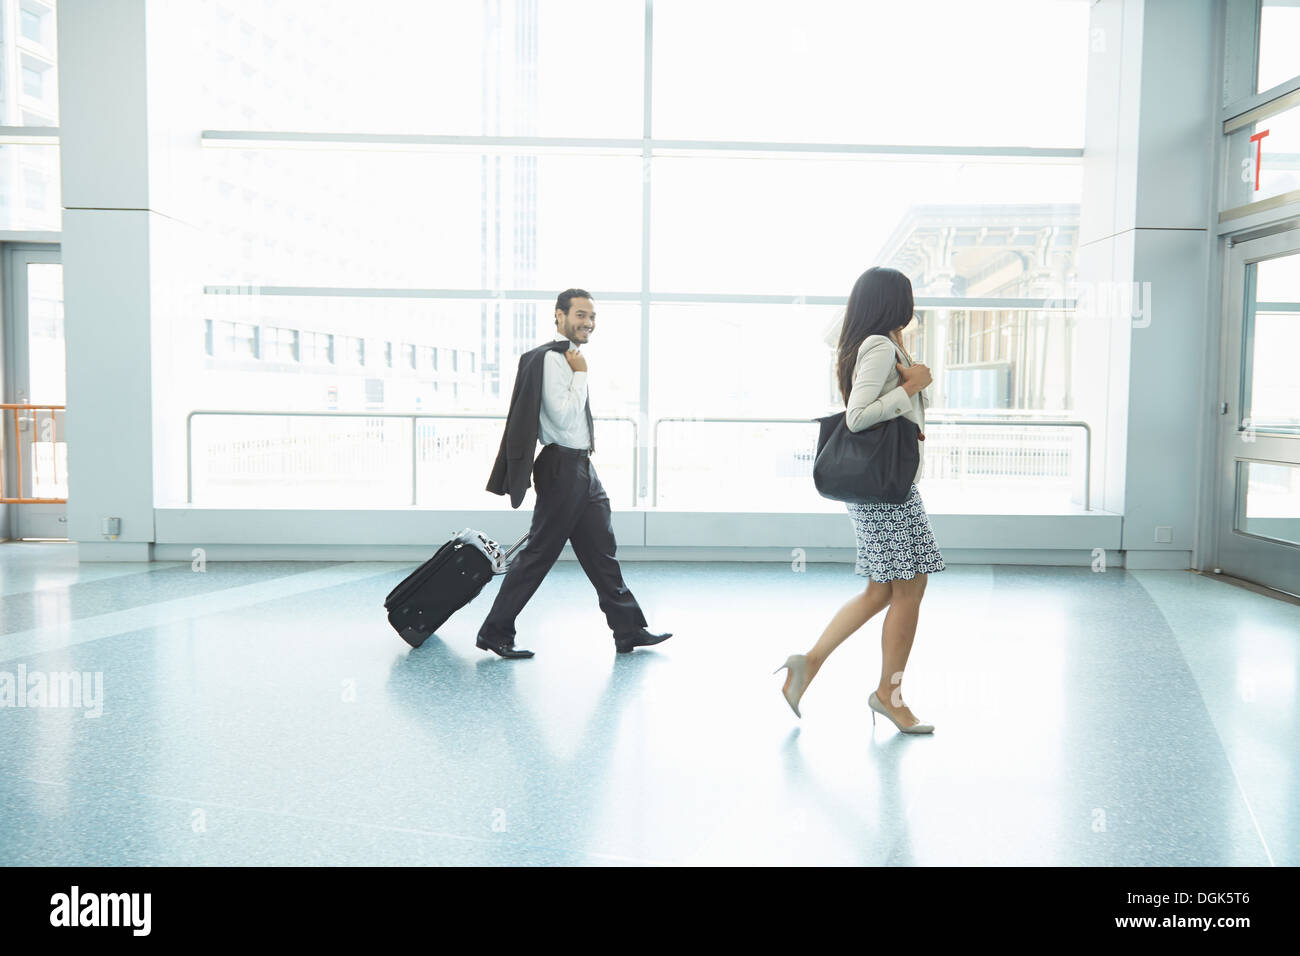 Businesspeople walking through Staten Island Ferry terminal pulling wheeled suitcase - Stock Image